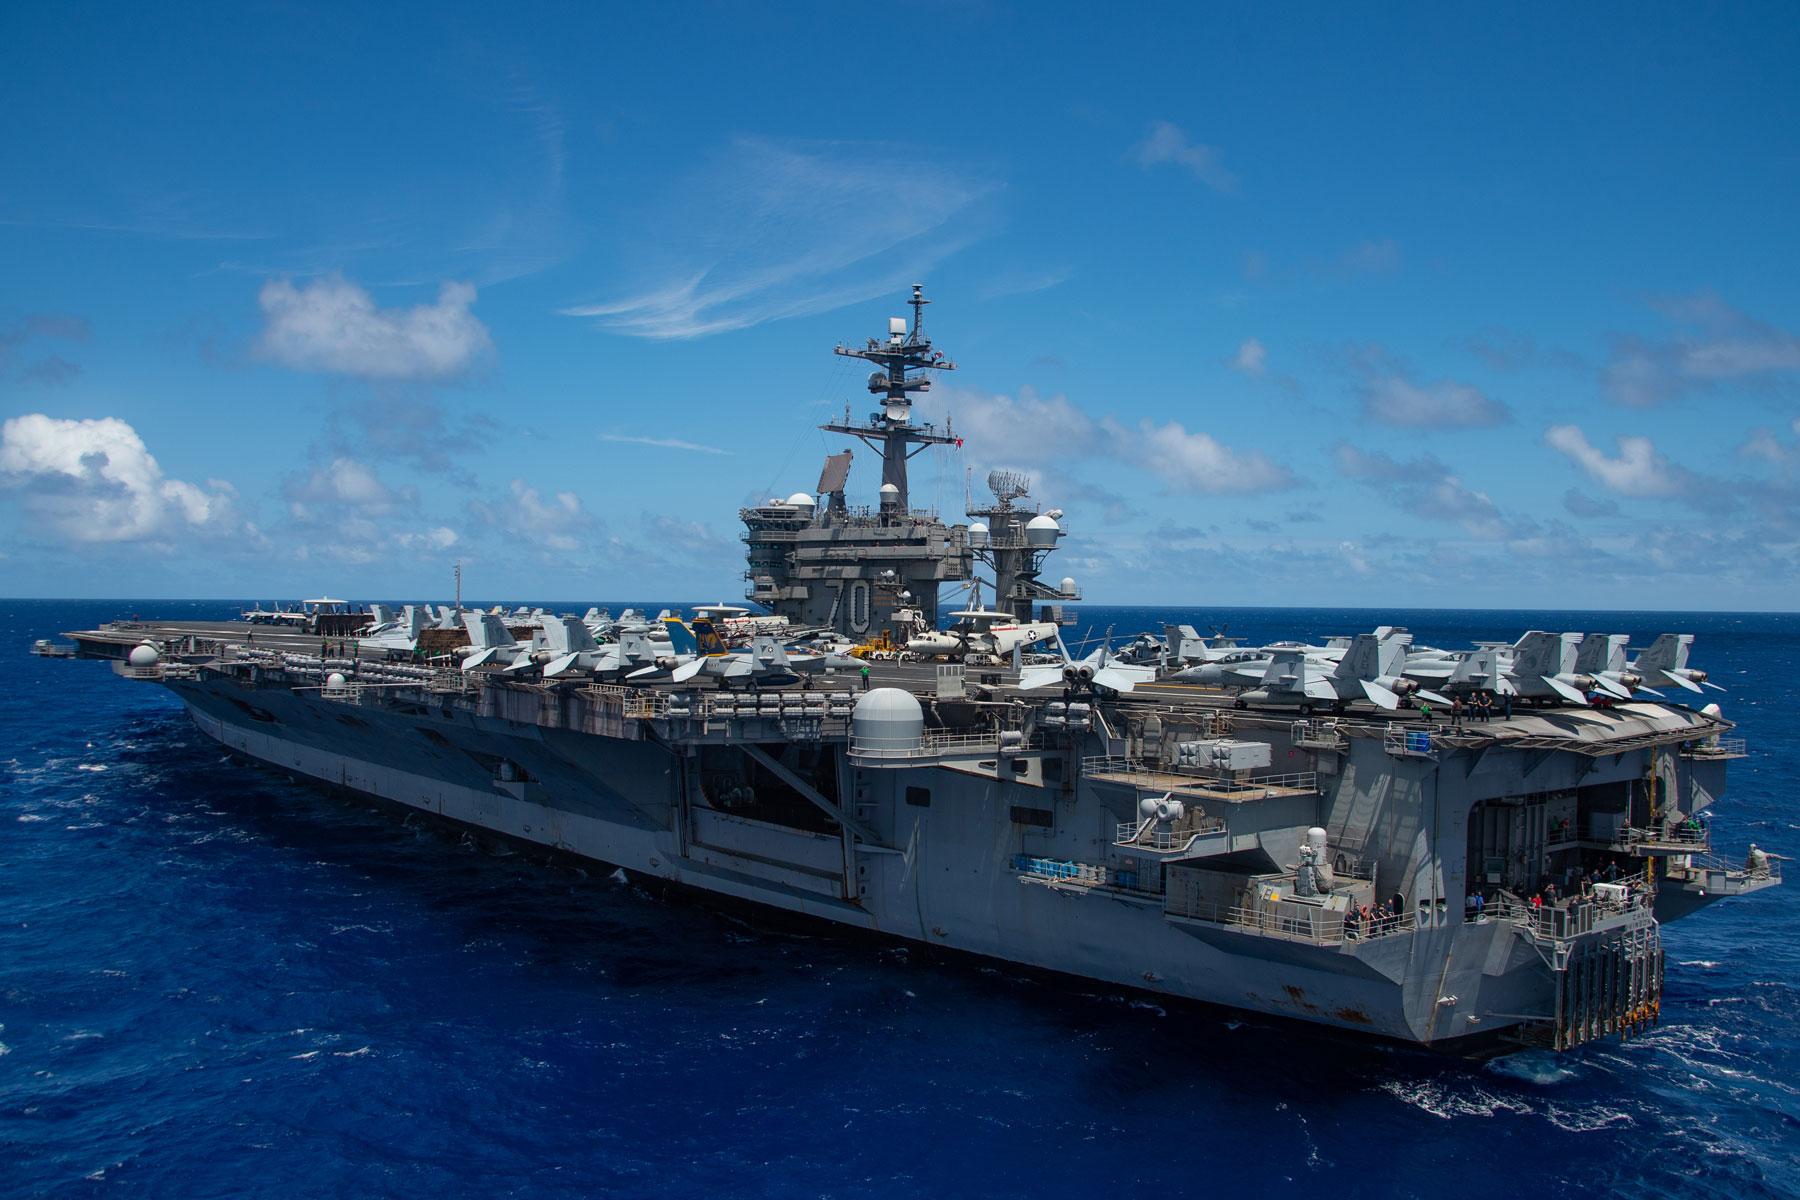 Aircraft Carrier Uss Carl Vinson Answers Distress Call